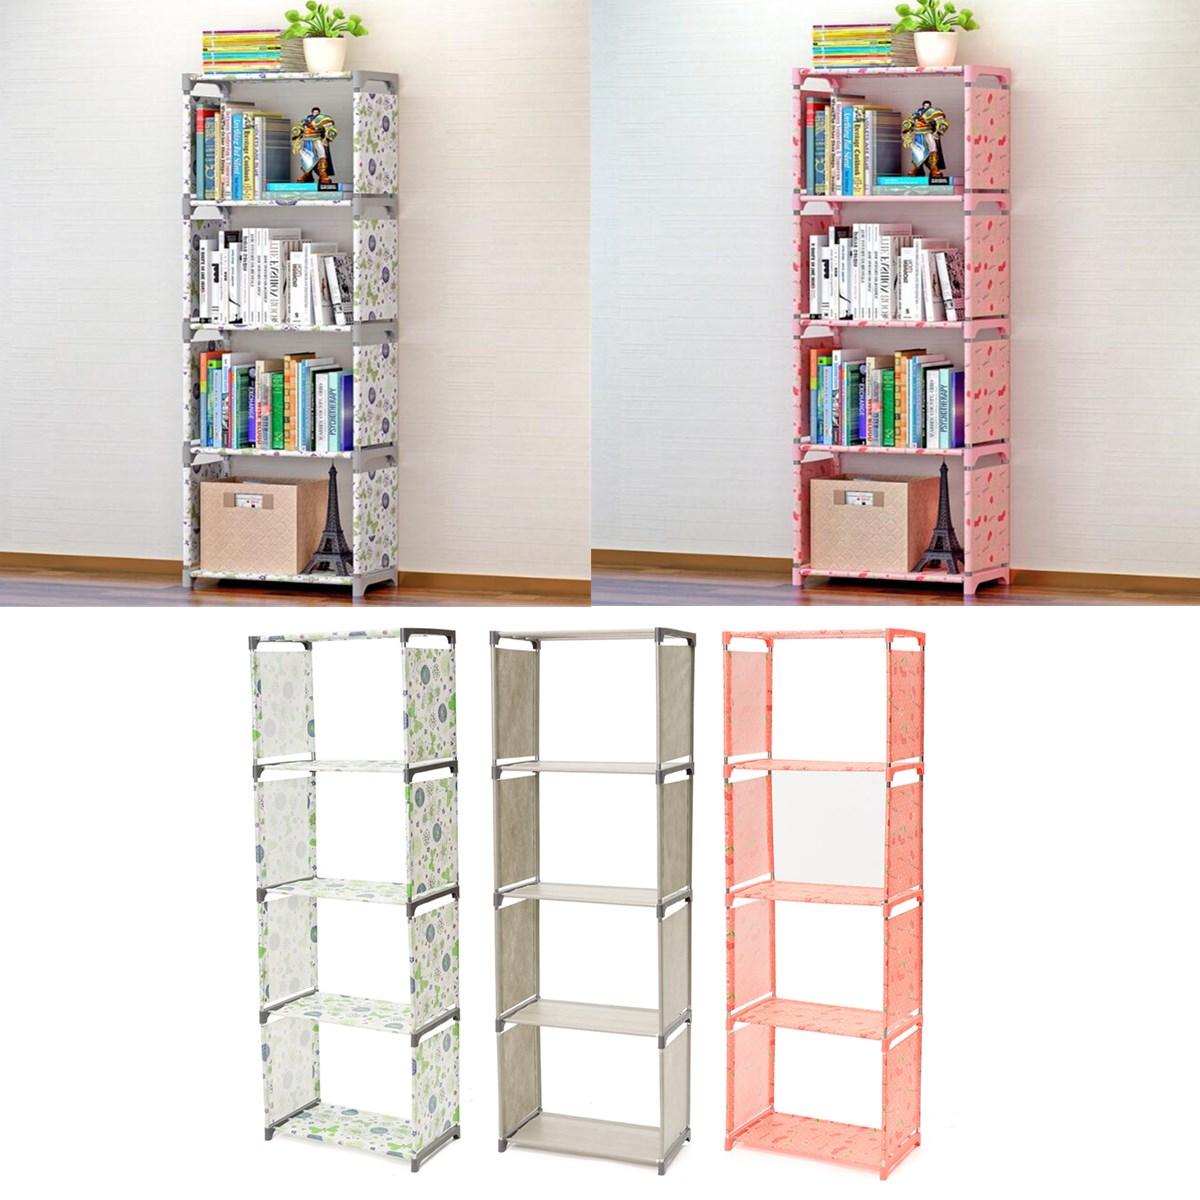 Us 25 05 28 Off Multi Tier Bookshelf Storage Shelf For Books Plants Sundries Diy Combination Cabinet Furniture Fabric Children Bookcase 4 Layer In